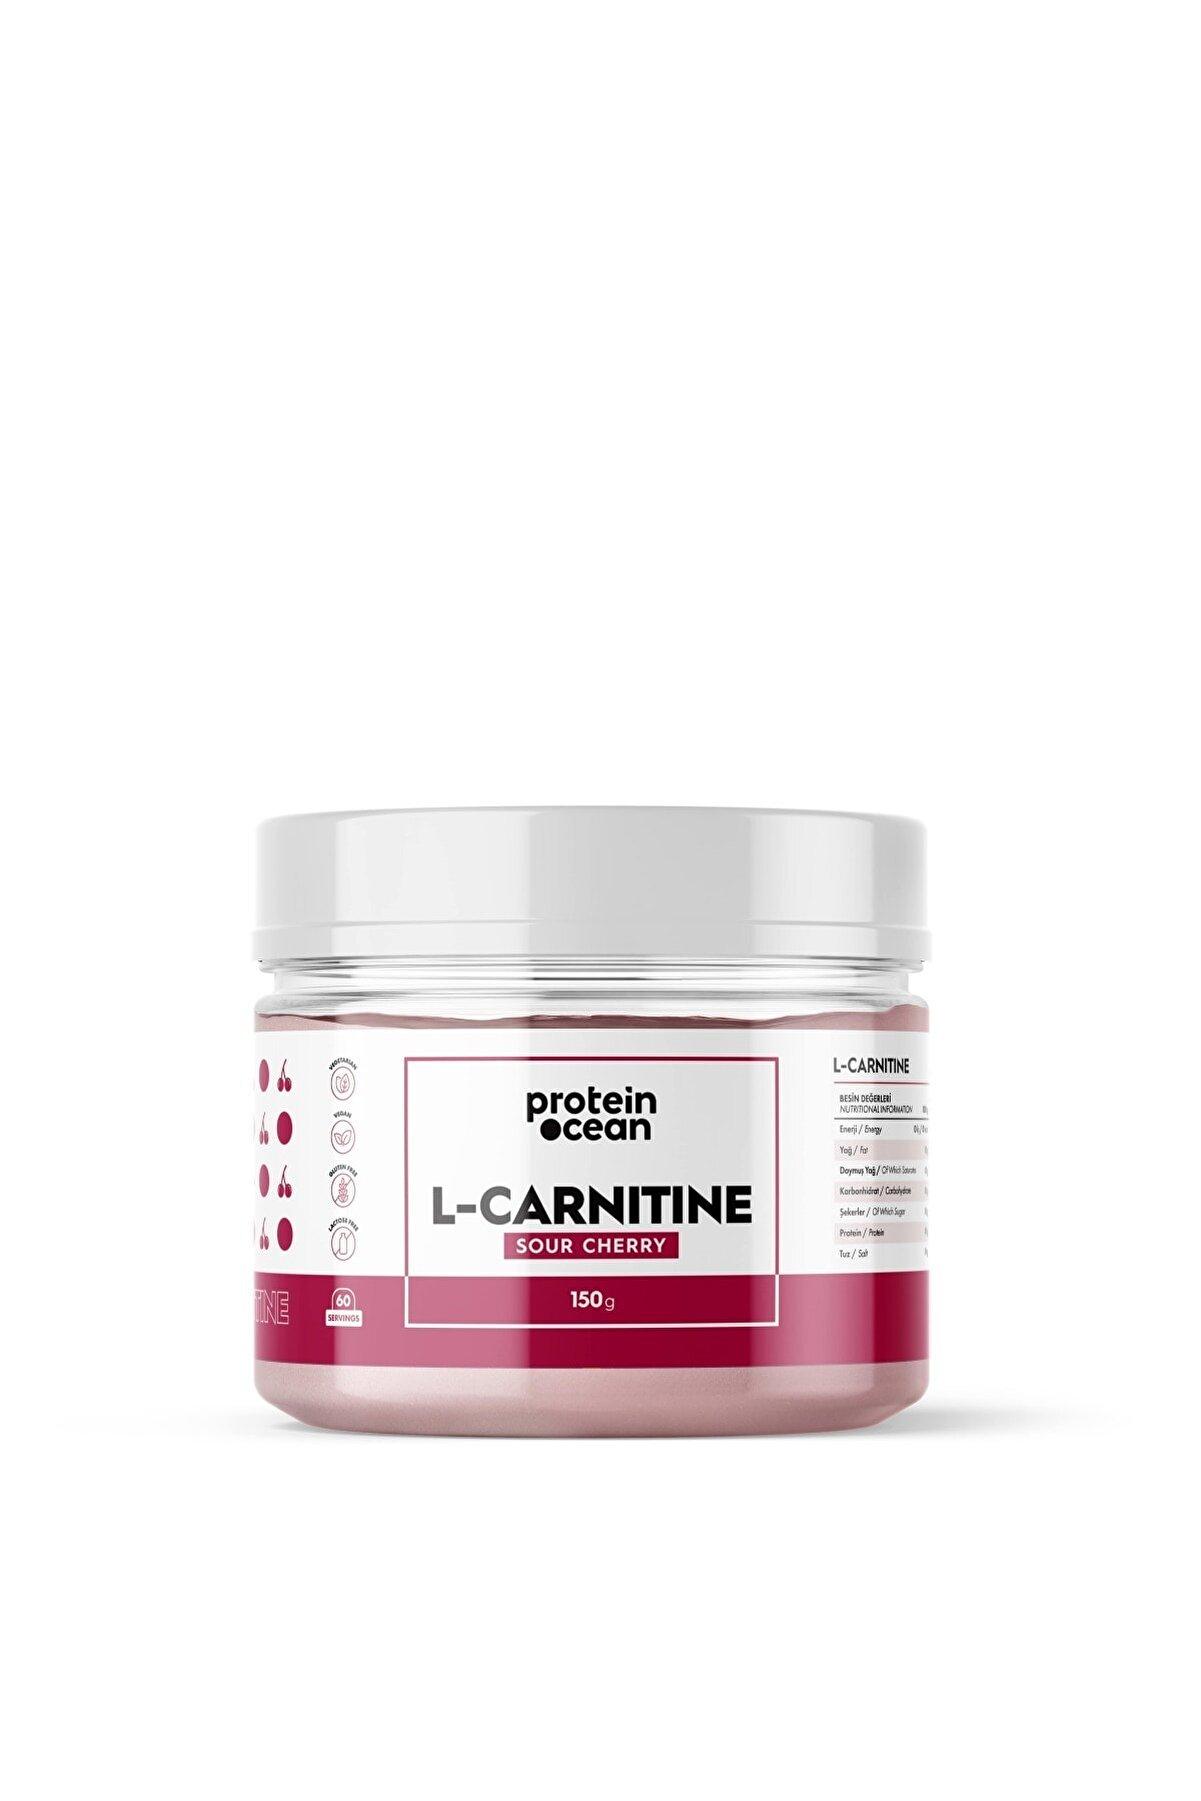 Proteinocean L-carnıtıne 150 gr Sour Cherry